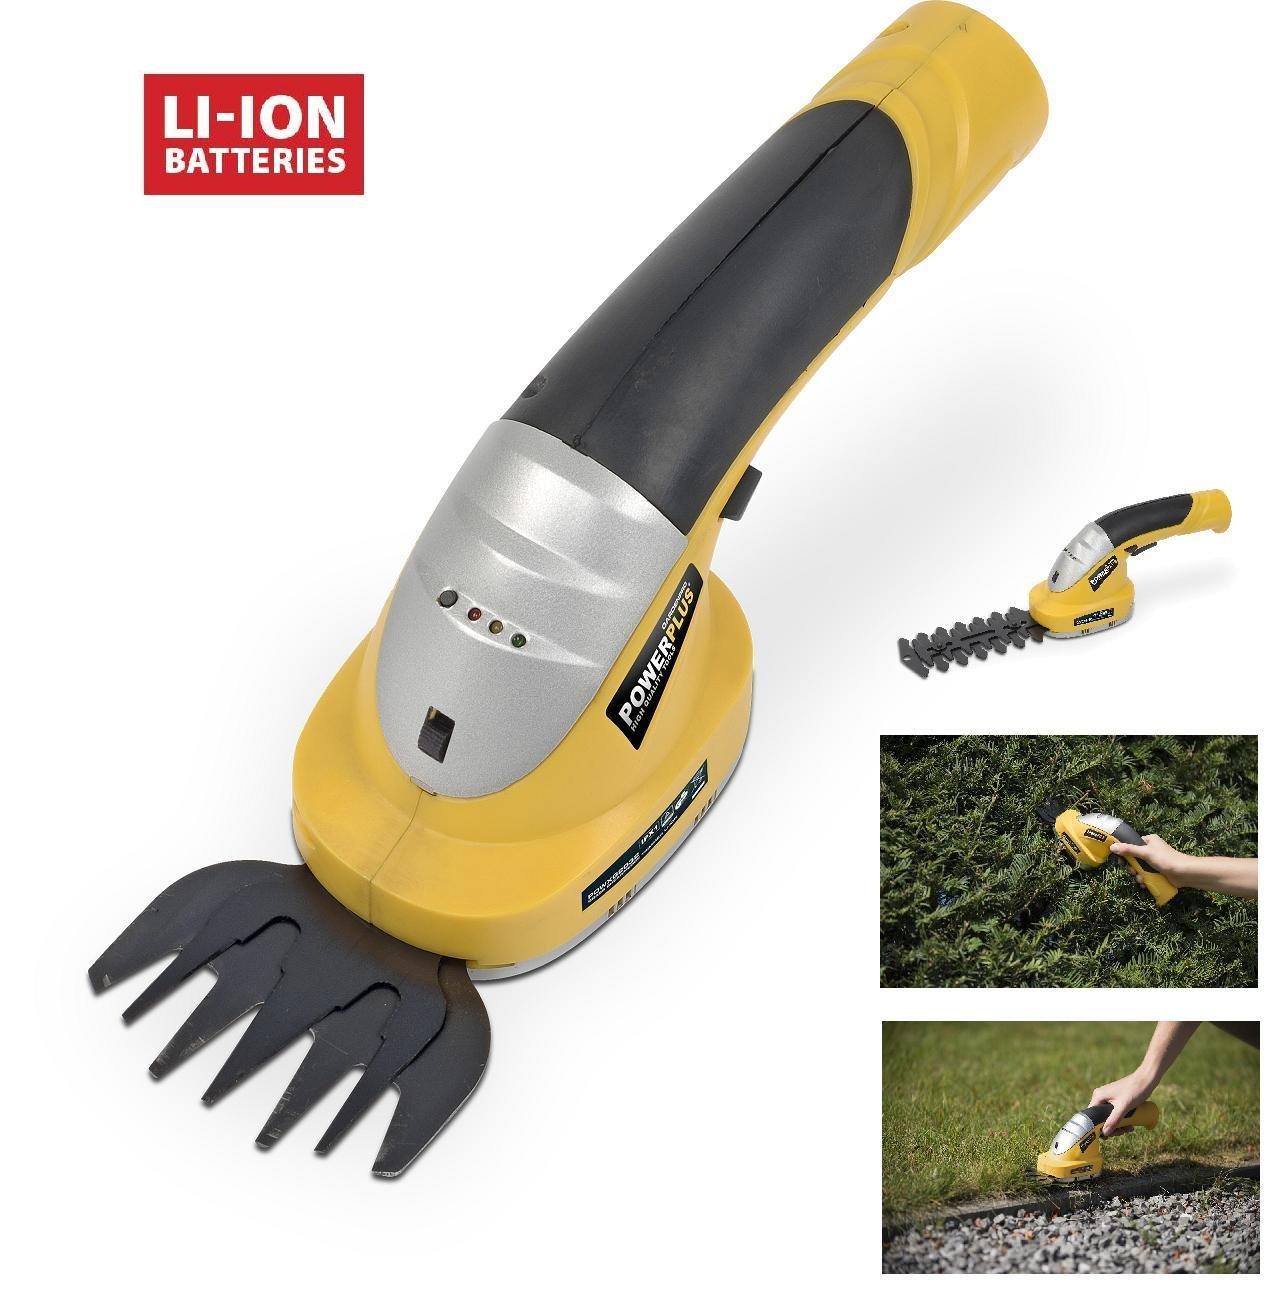 Hand Lawn And Hedge Shears 7.2V Powerplus 5400338031236 10307